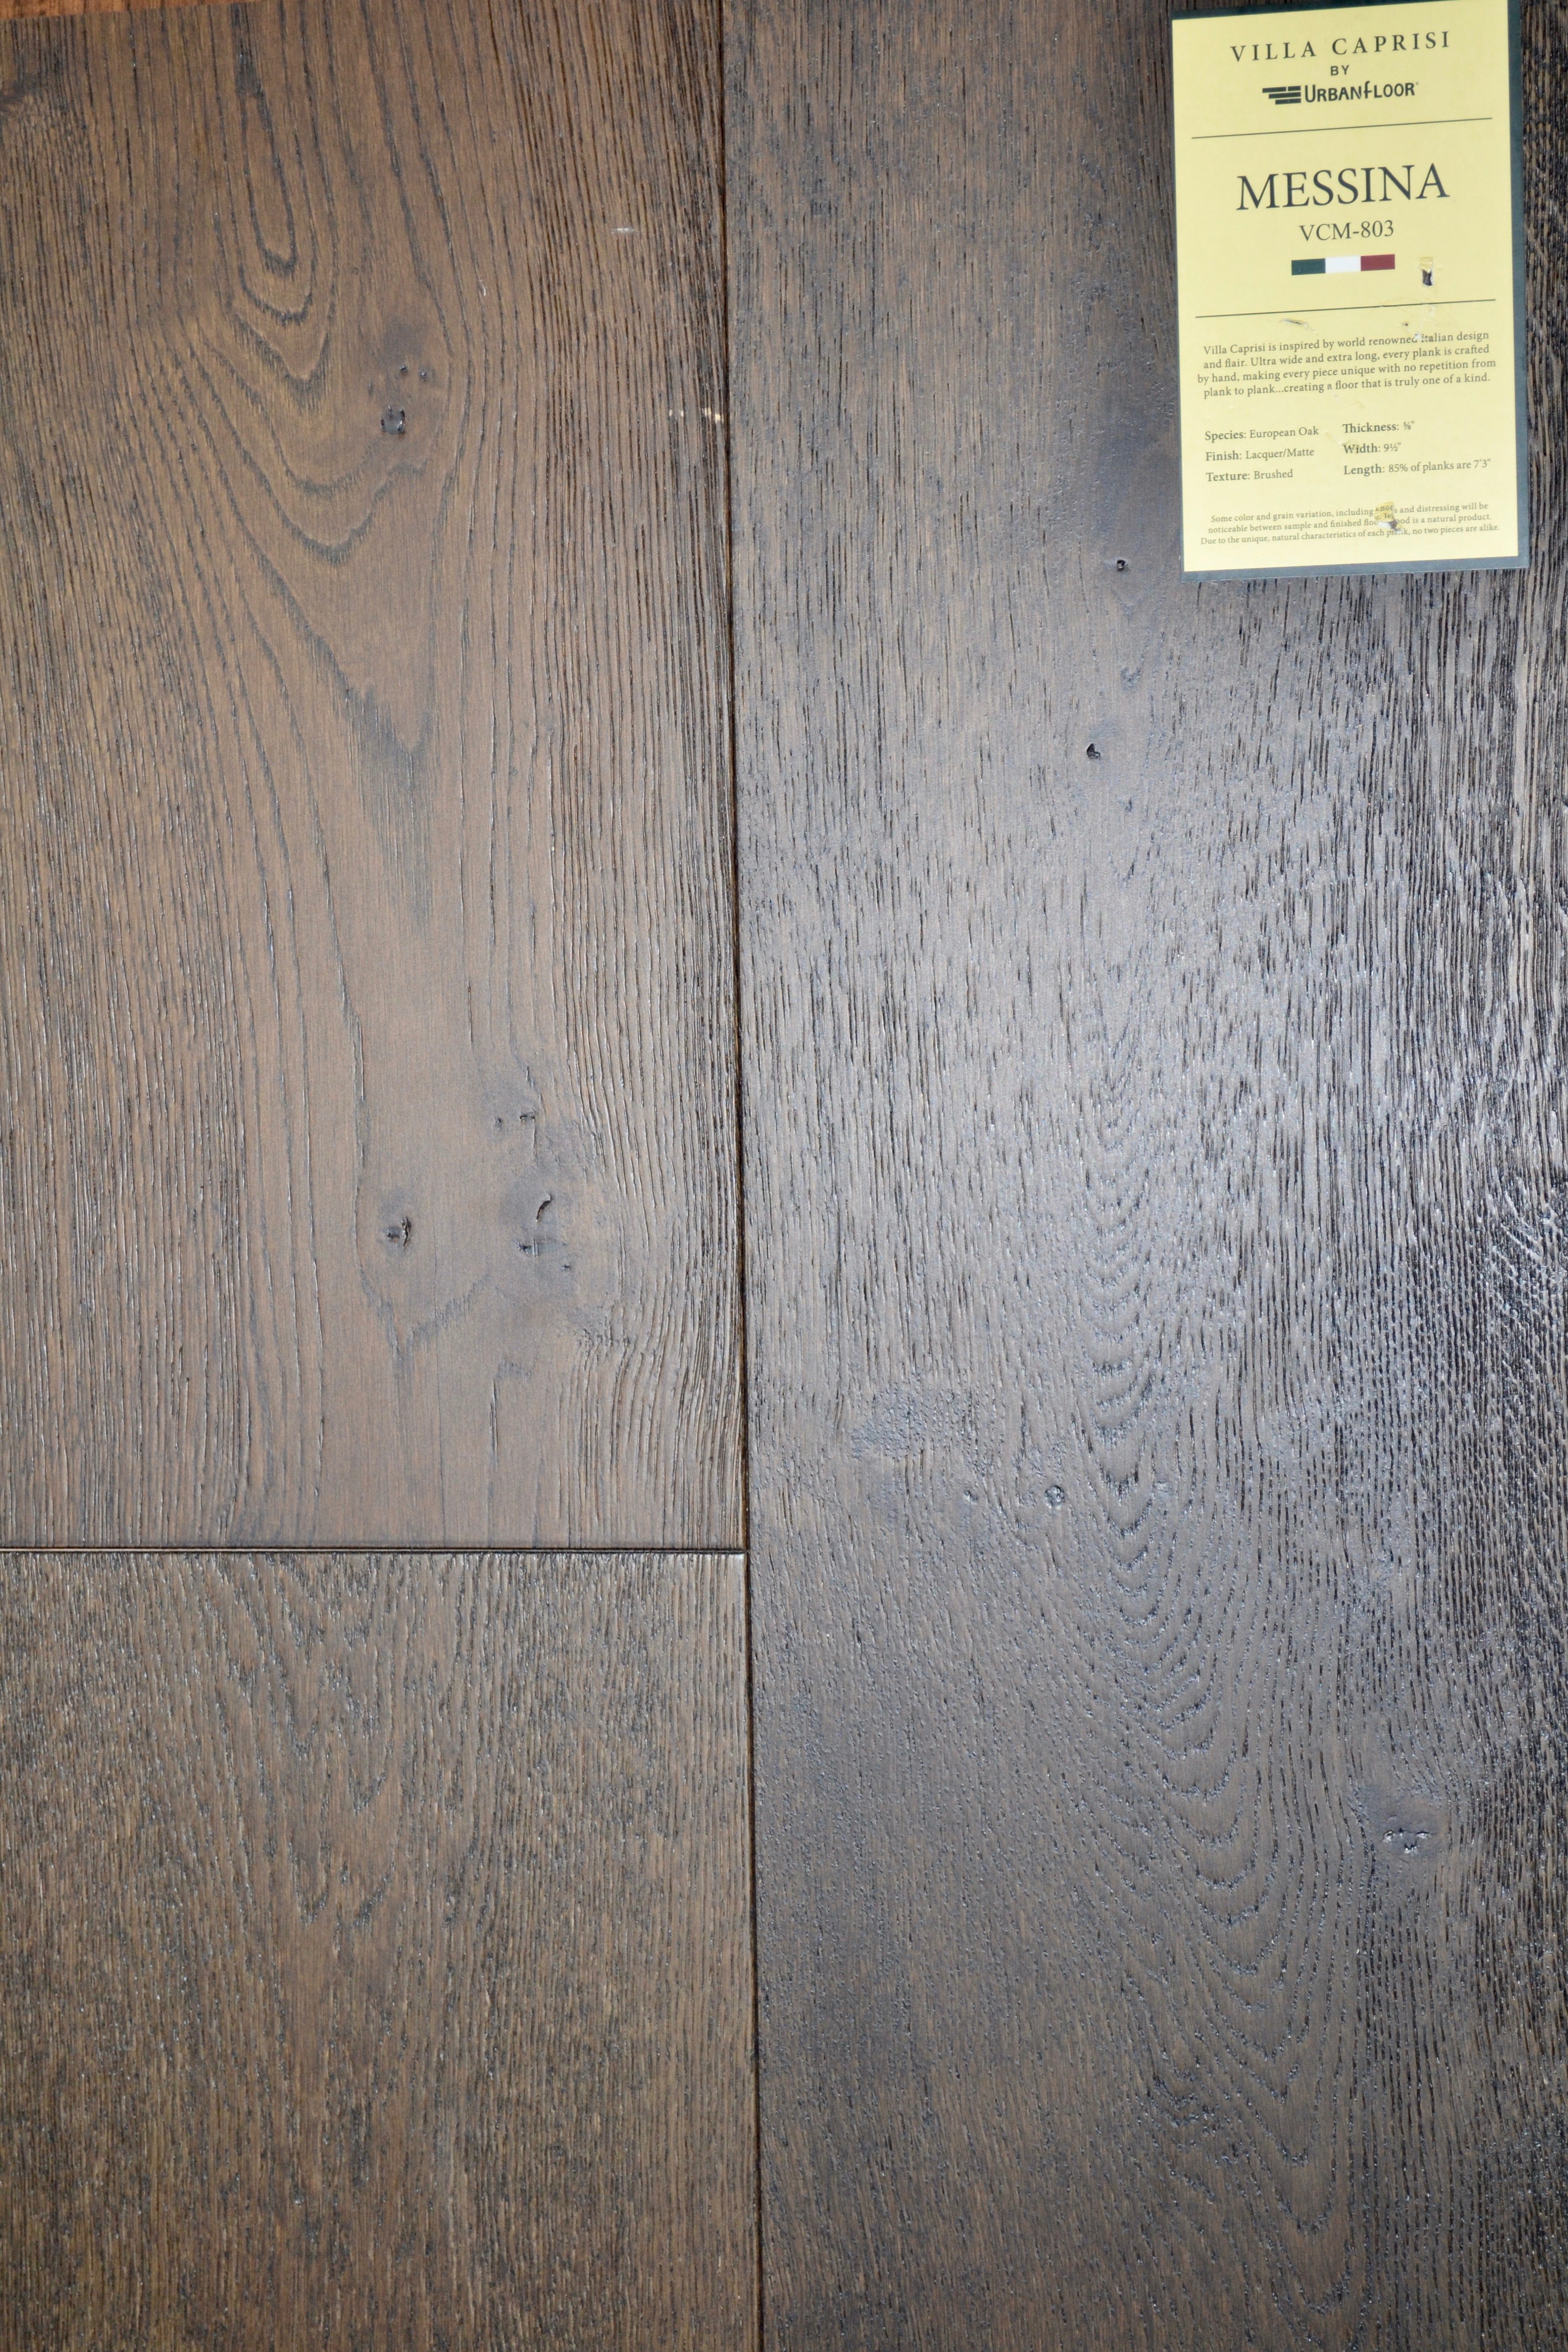 can you mix hardwood floor colors of villa caprisi fine european hardwood millennium hardwood throughout european style inspired designer oak floor messina by villa caprisi